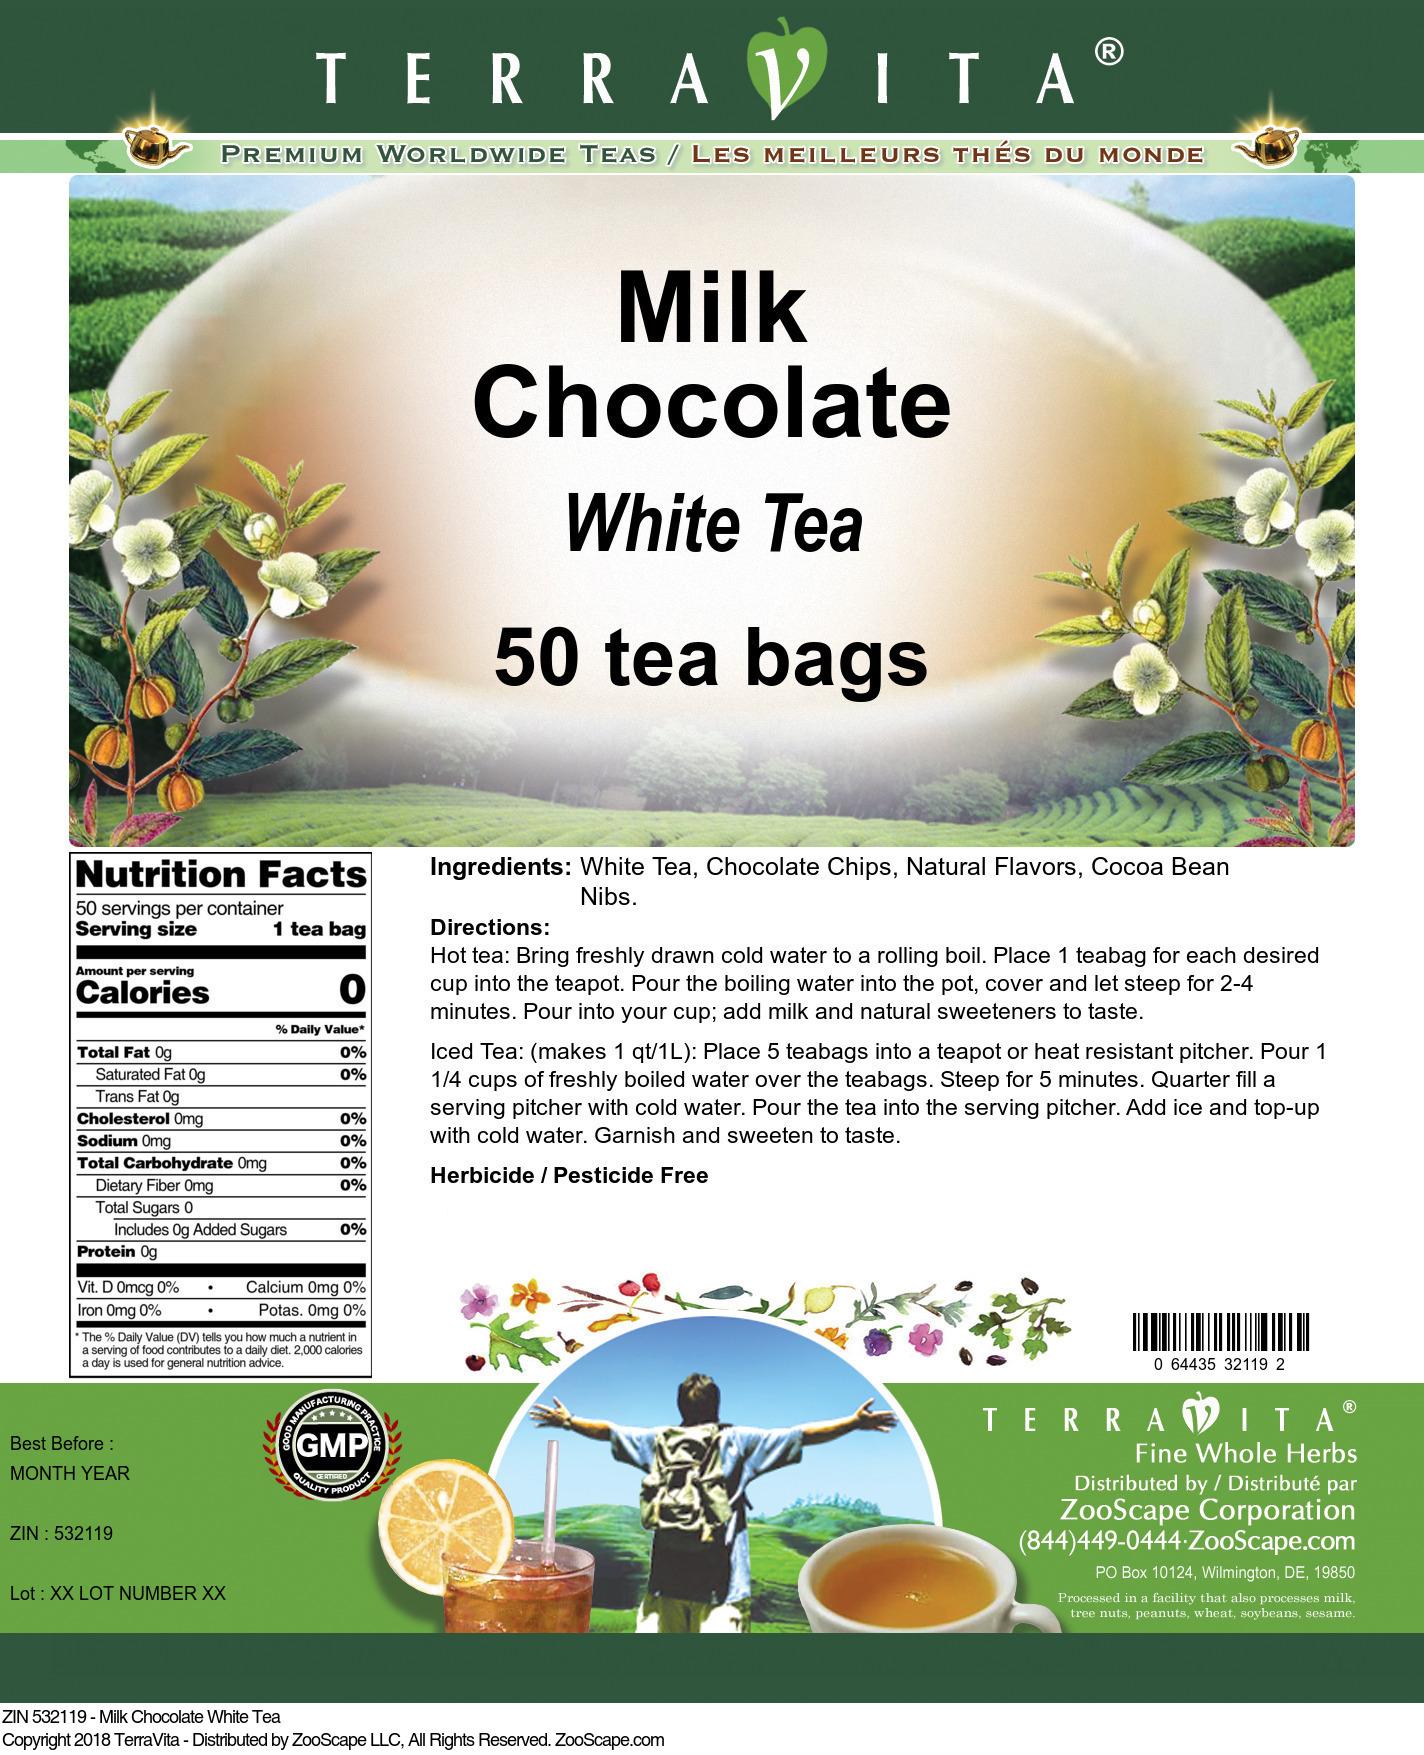 Milk Chocolate White Tea